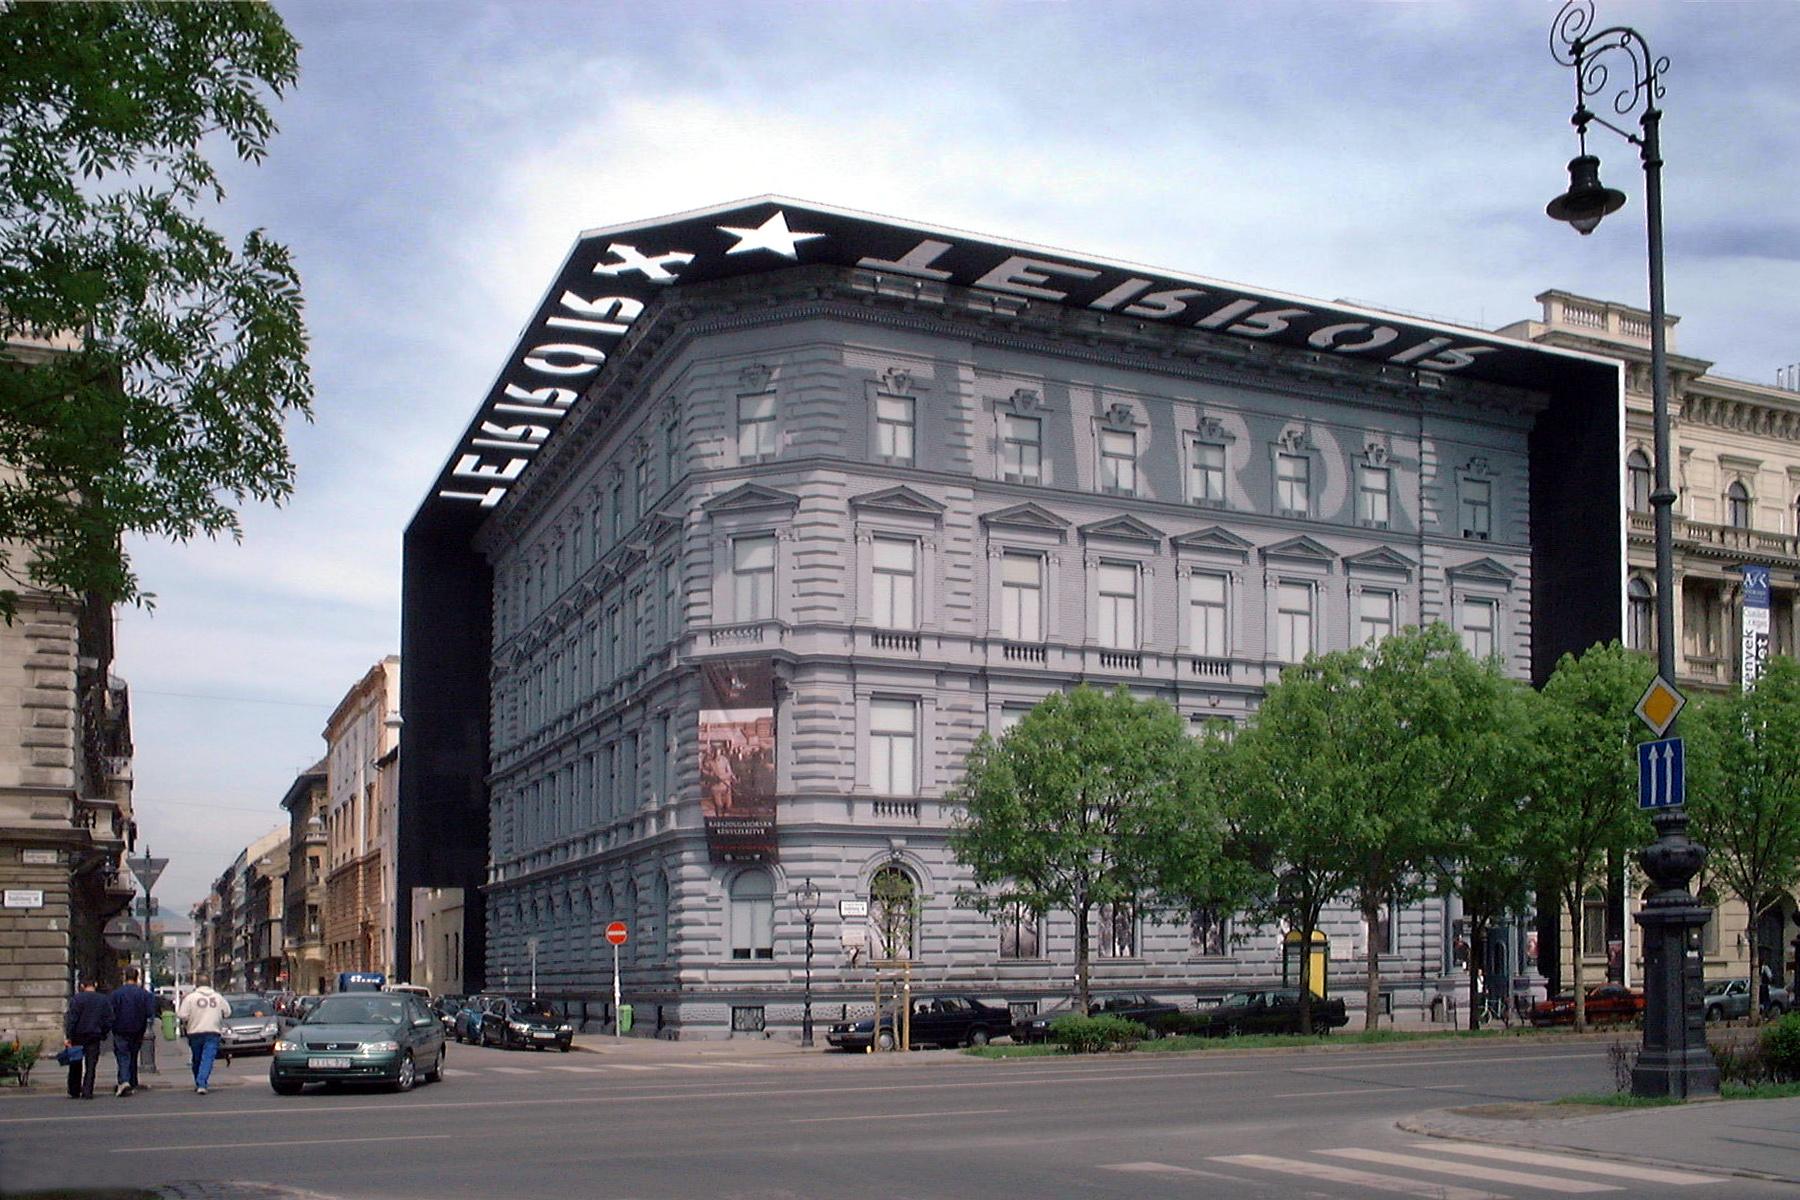 Budapest Terror Museum